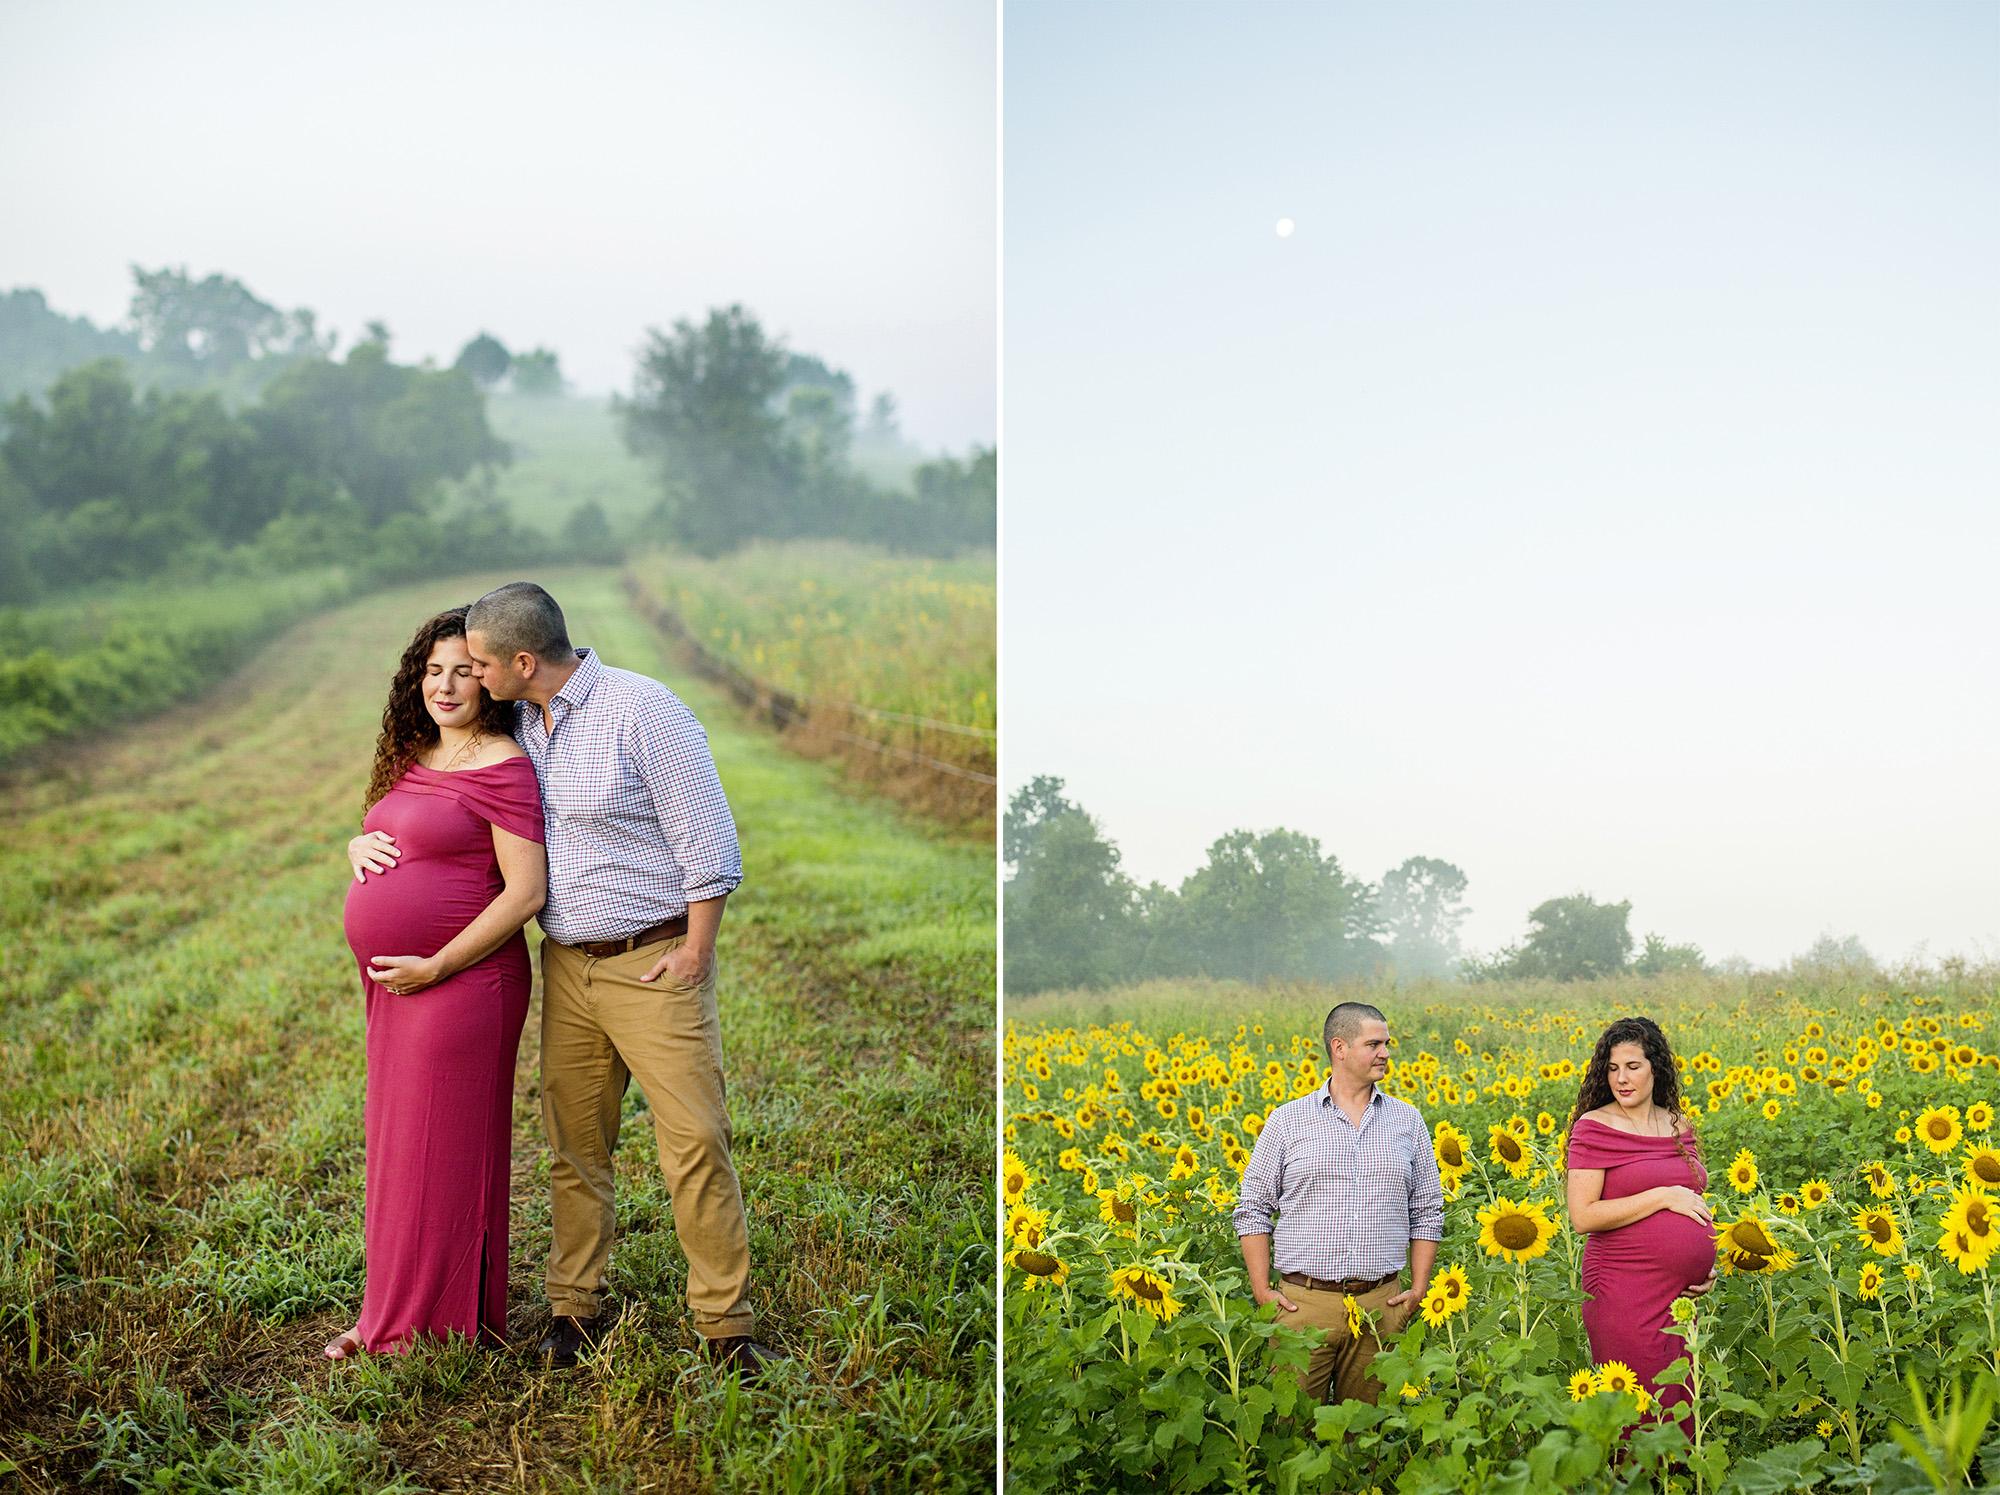 Seriously_Sabrina_Photography_Lexington_Frankfort_Kentucky_Maternity_Mini_Sunflowers_Johns6.jpg